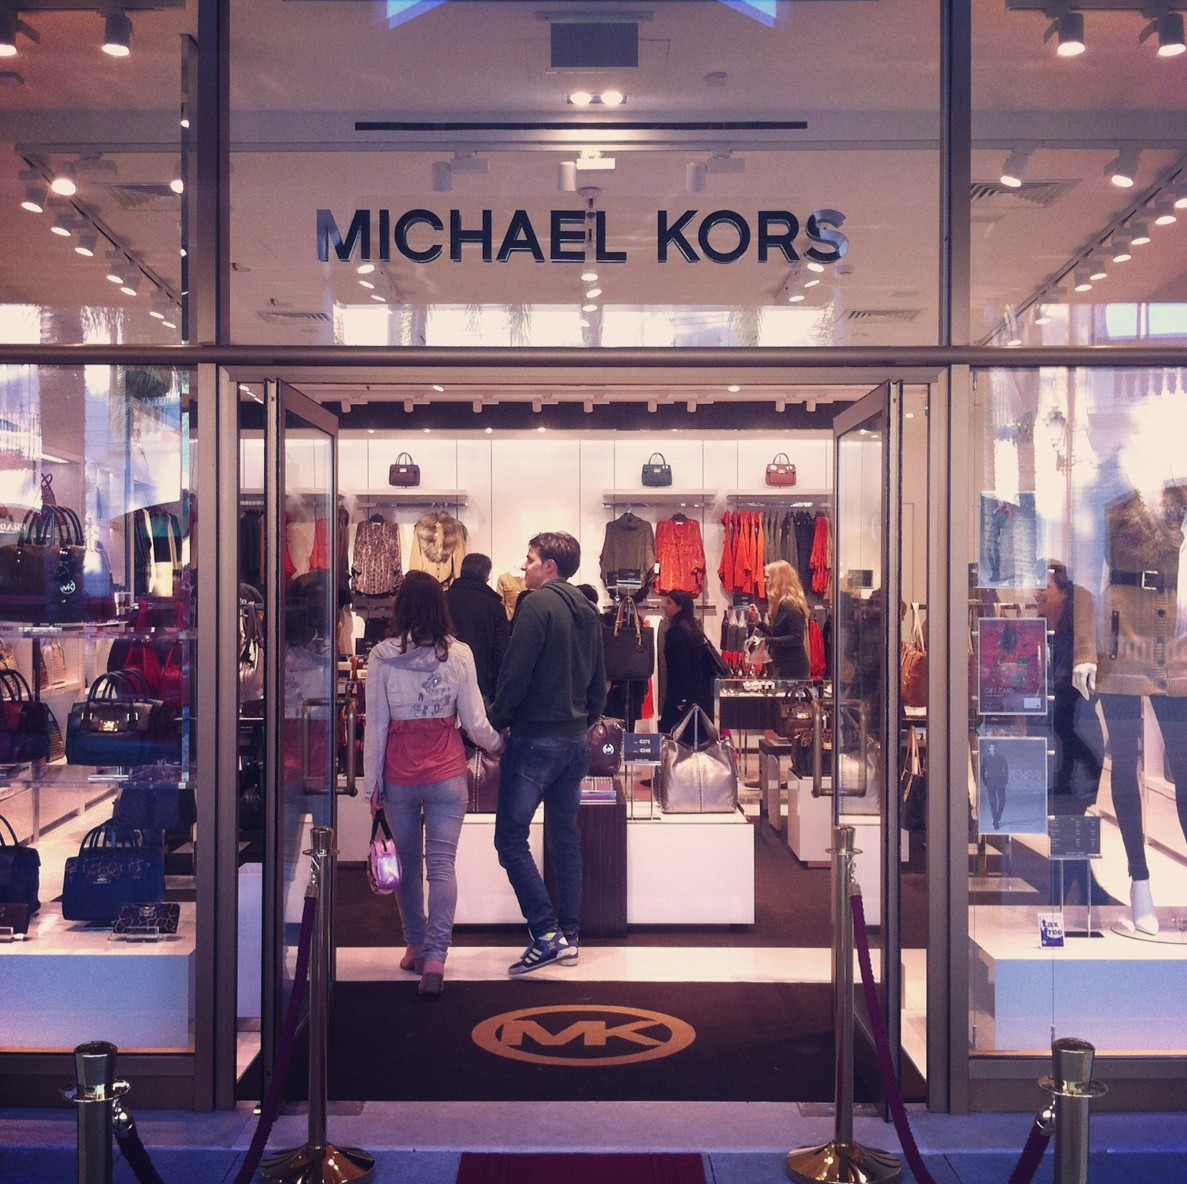 Michael Kors at La Reggia Designer Outlet – My Glamour Attitude